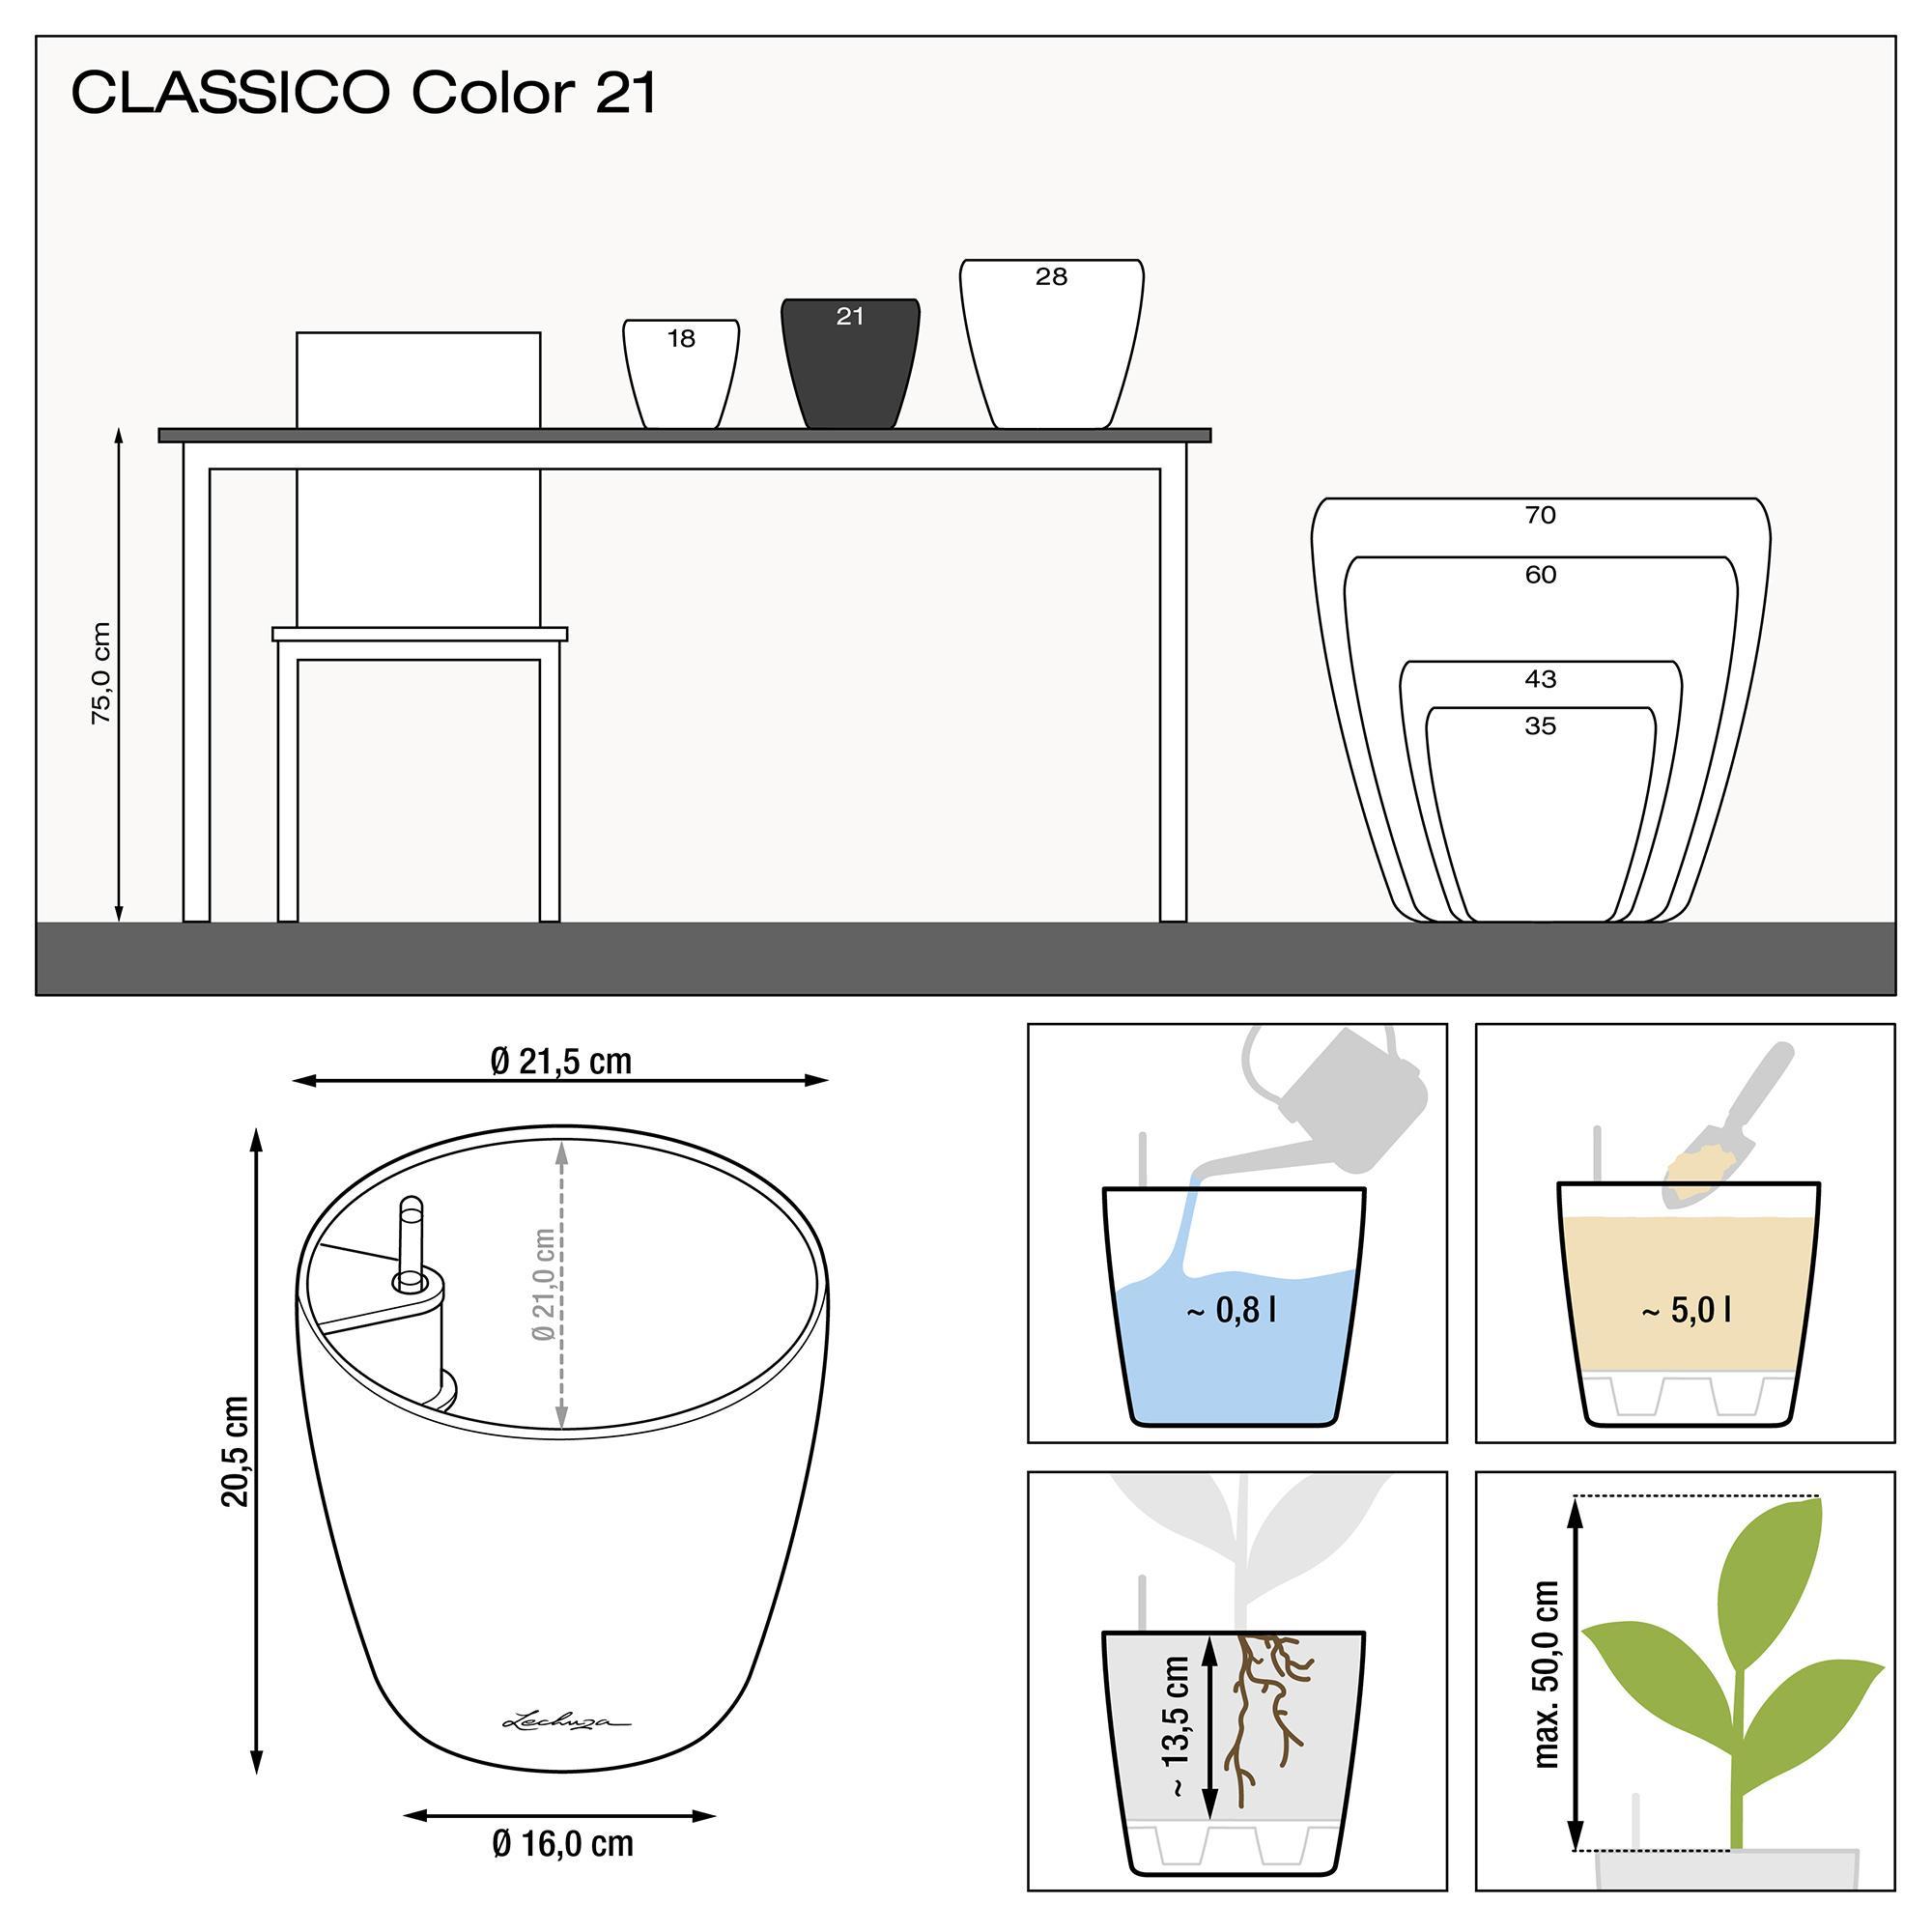 CLASSICO Color 21 gris pizarra - Imagen 2